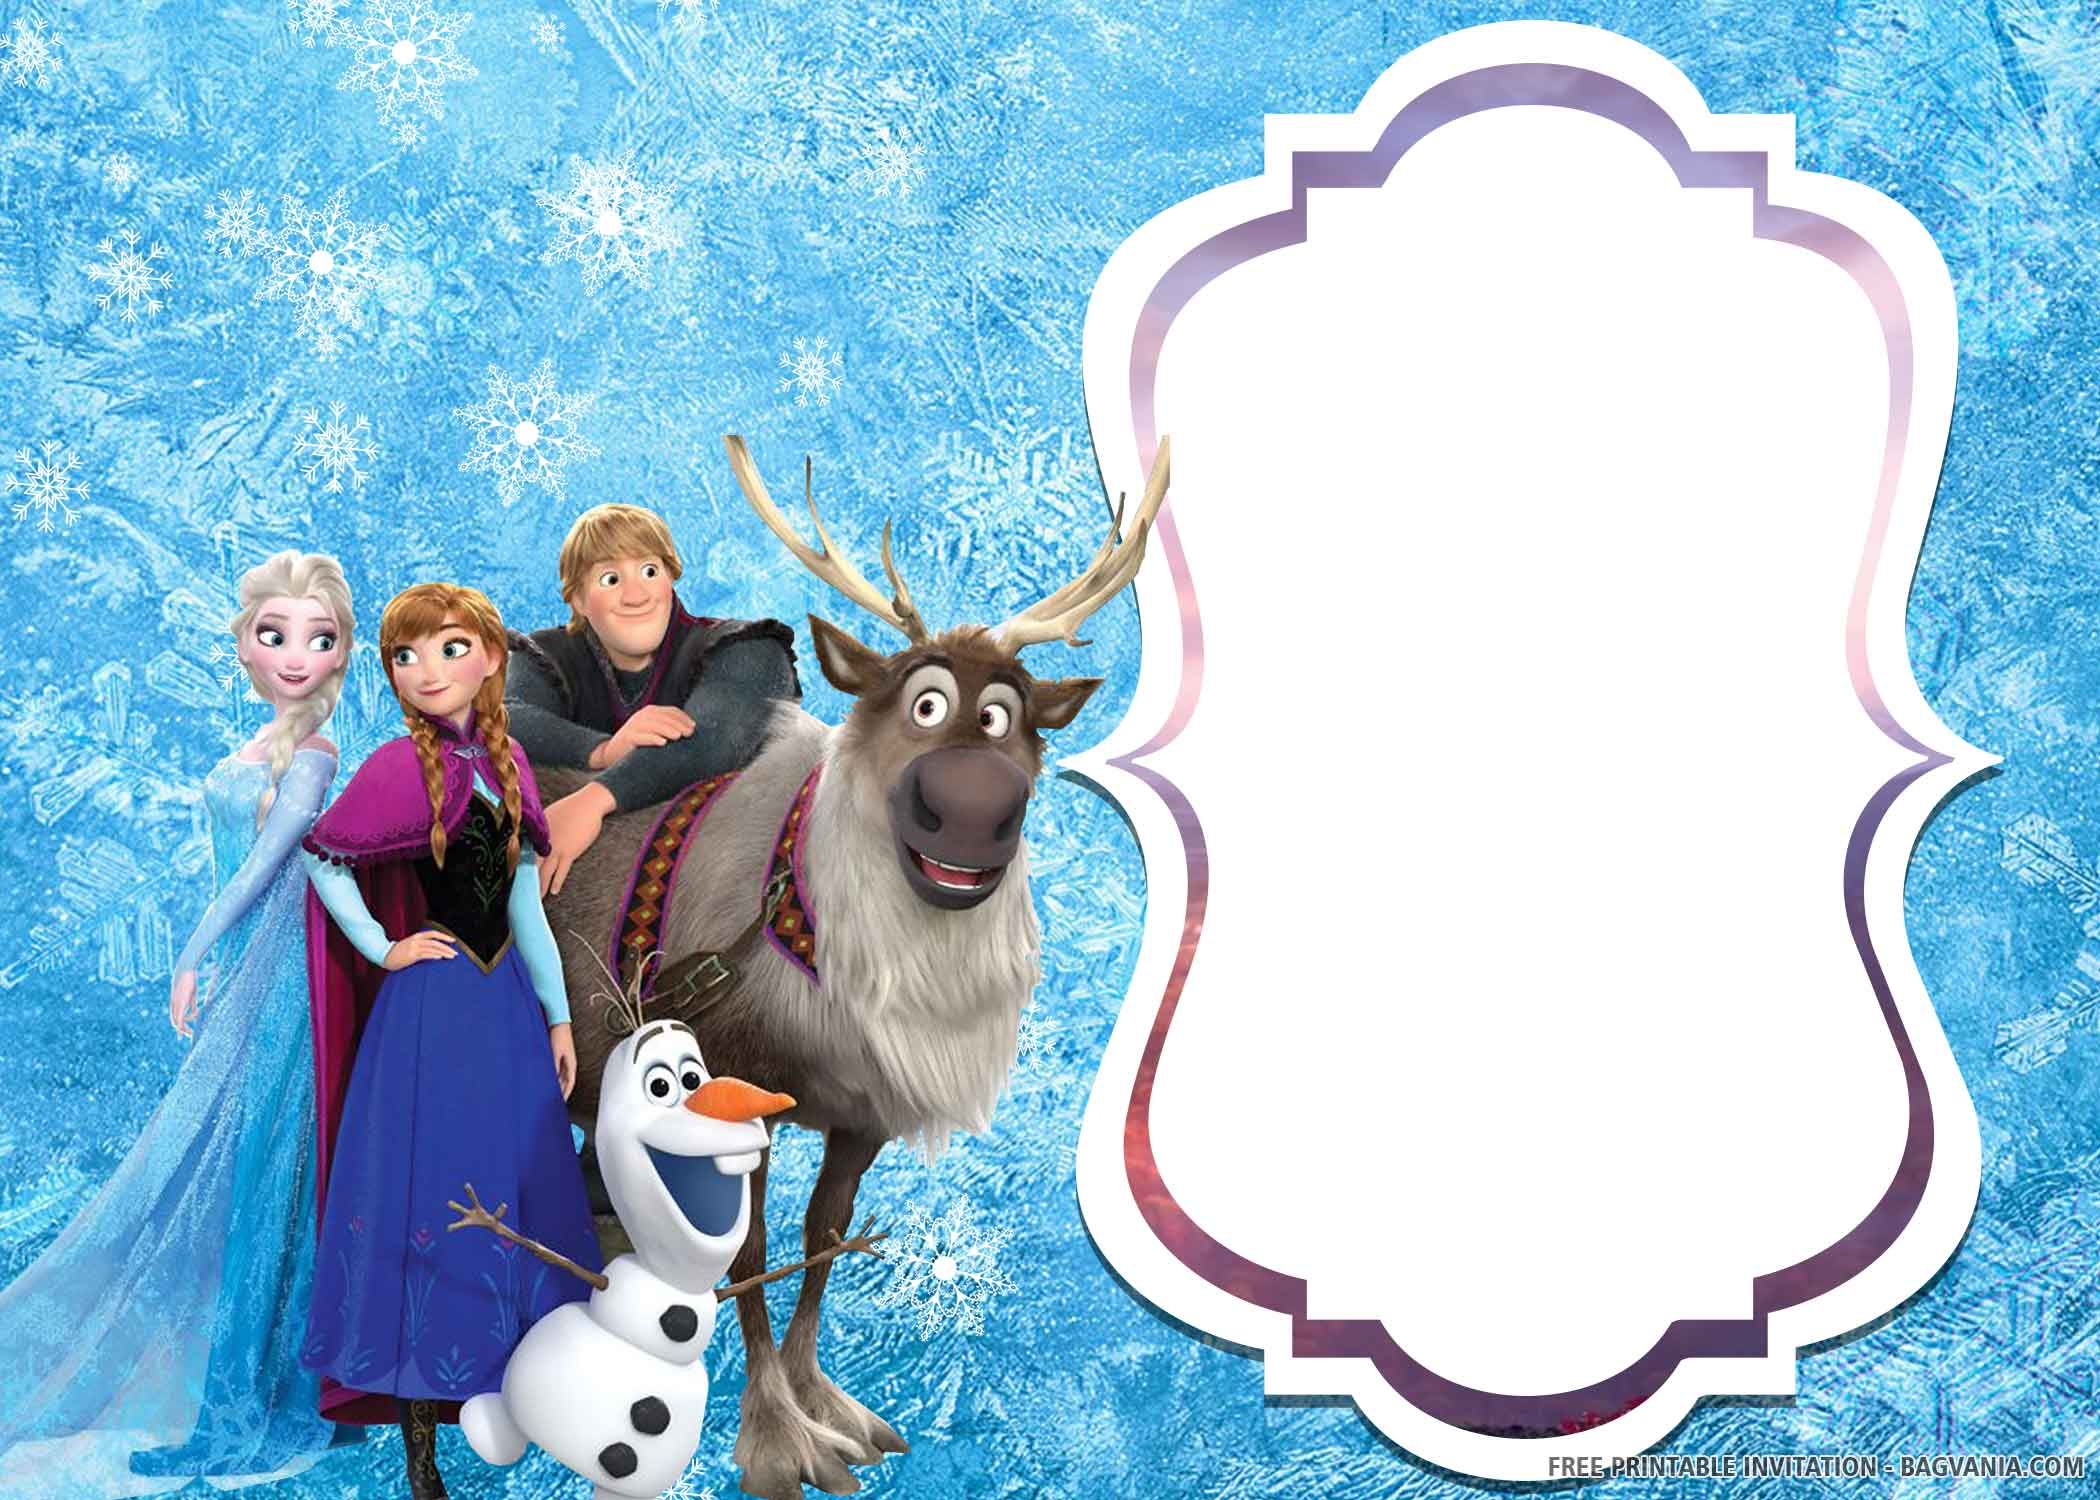 Free Printable Elsa Of Frozen 2 Birthday Invitation Templates Frozen Birthday Invitations Birthday Card Template Frozen 2 Birthday